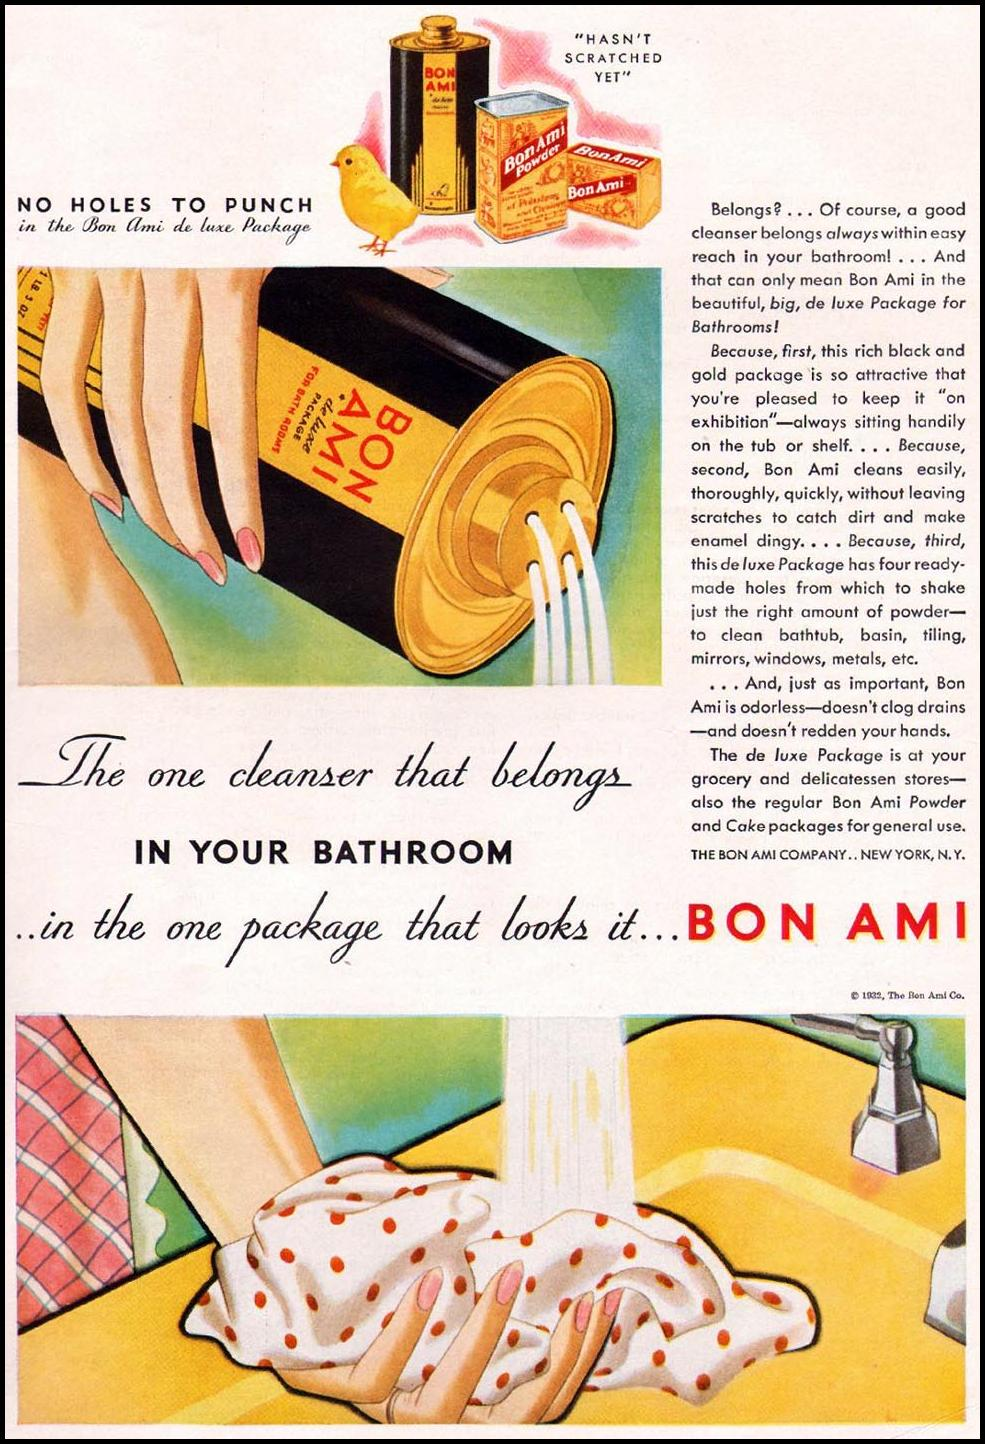 BON AMI BETTER HOMES AND GARDENS 03/01/1932 INSIDE BACK